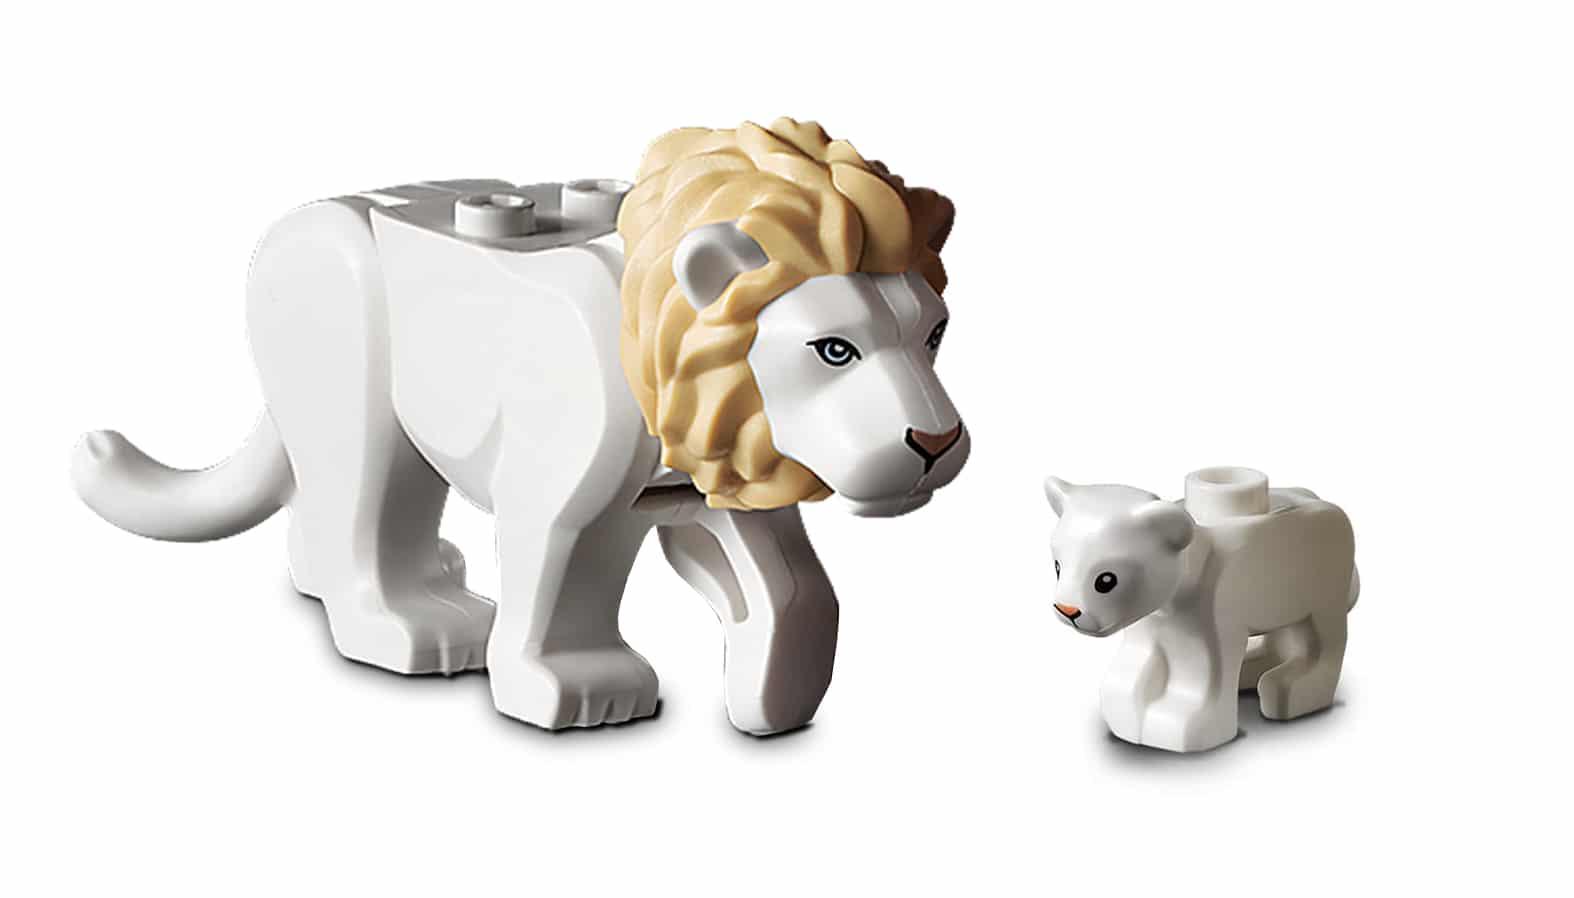 LEGO Weisse Loewen Großkatzen